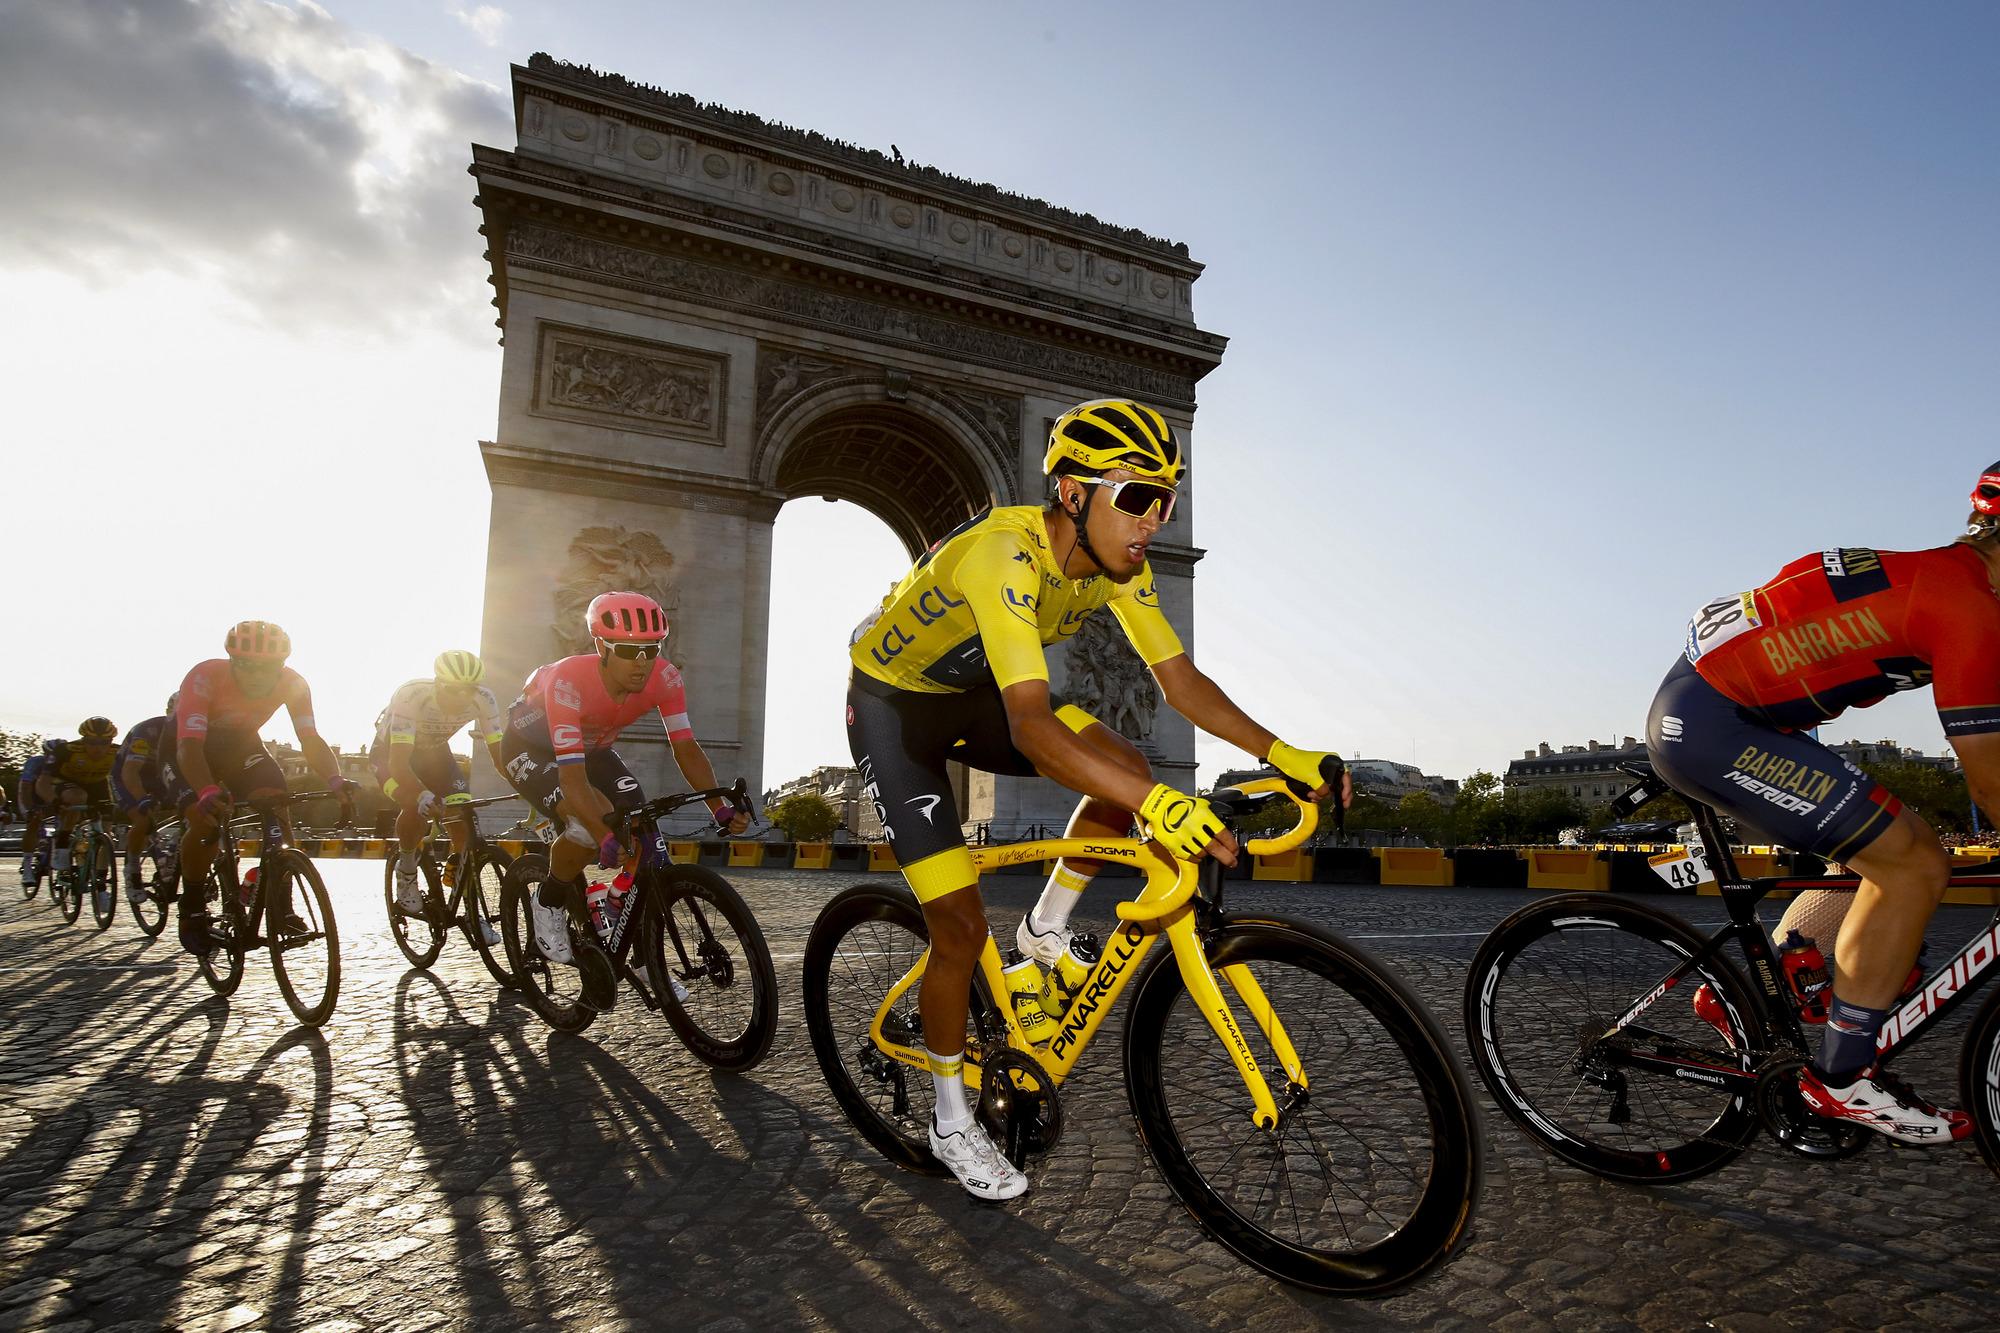 Tour de France may be postponed again | Cyclingnews